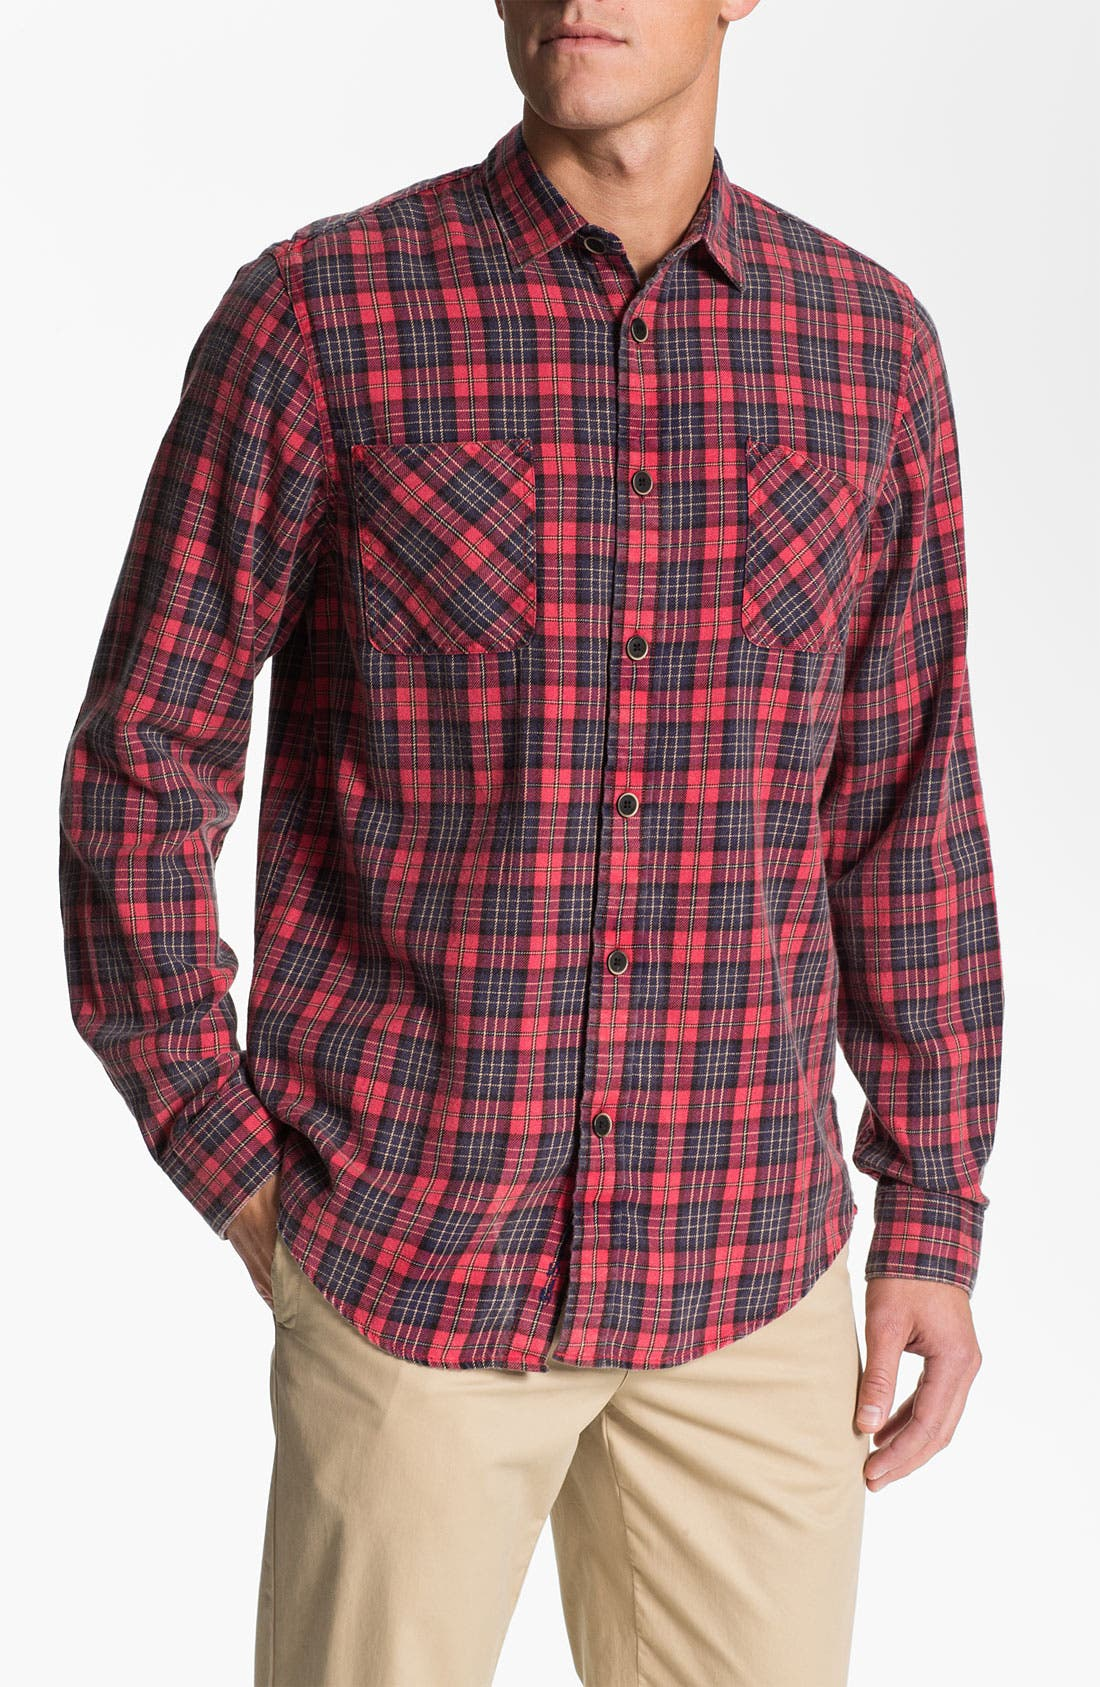 Alternate Image 1 Selected - Ben Sherman 'Shoreditch' Plaid Twill Shirt